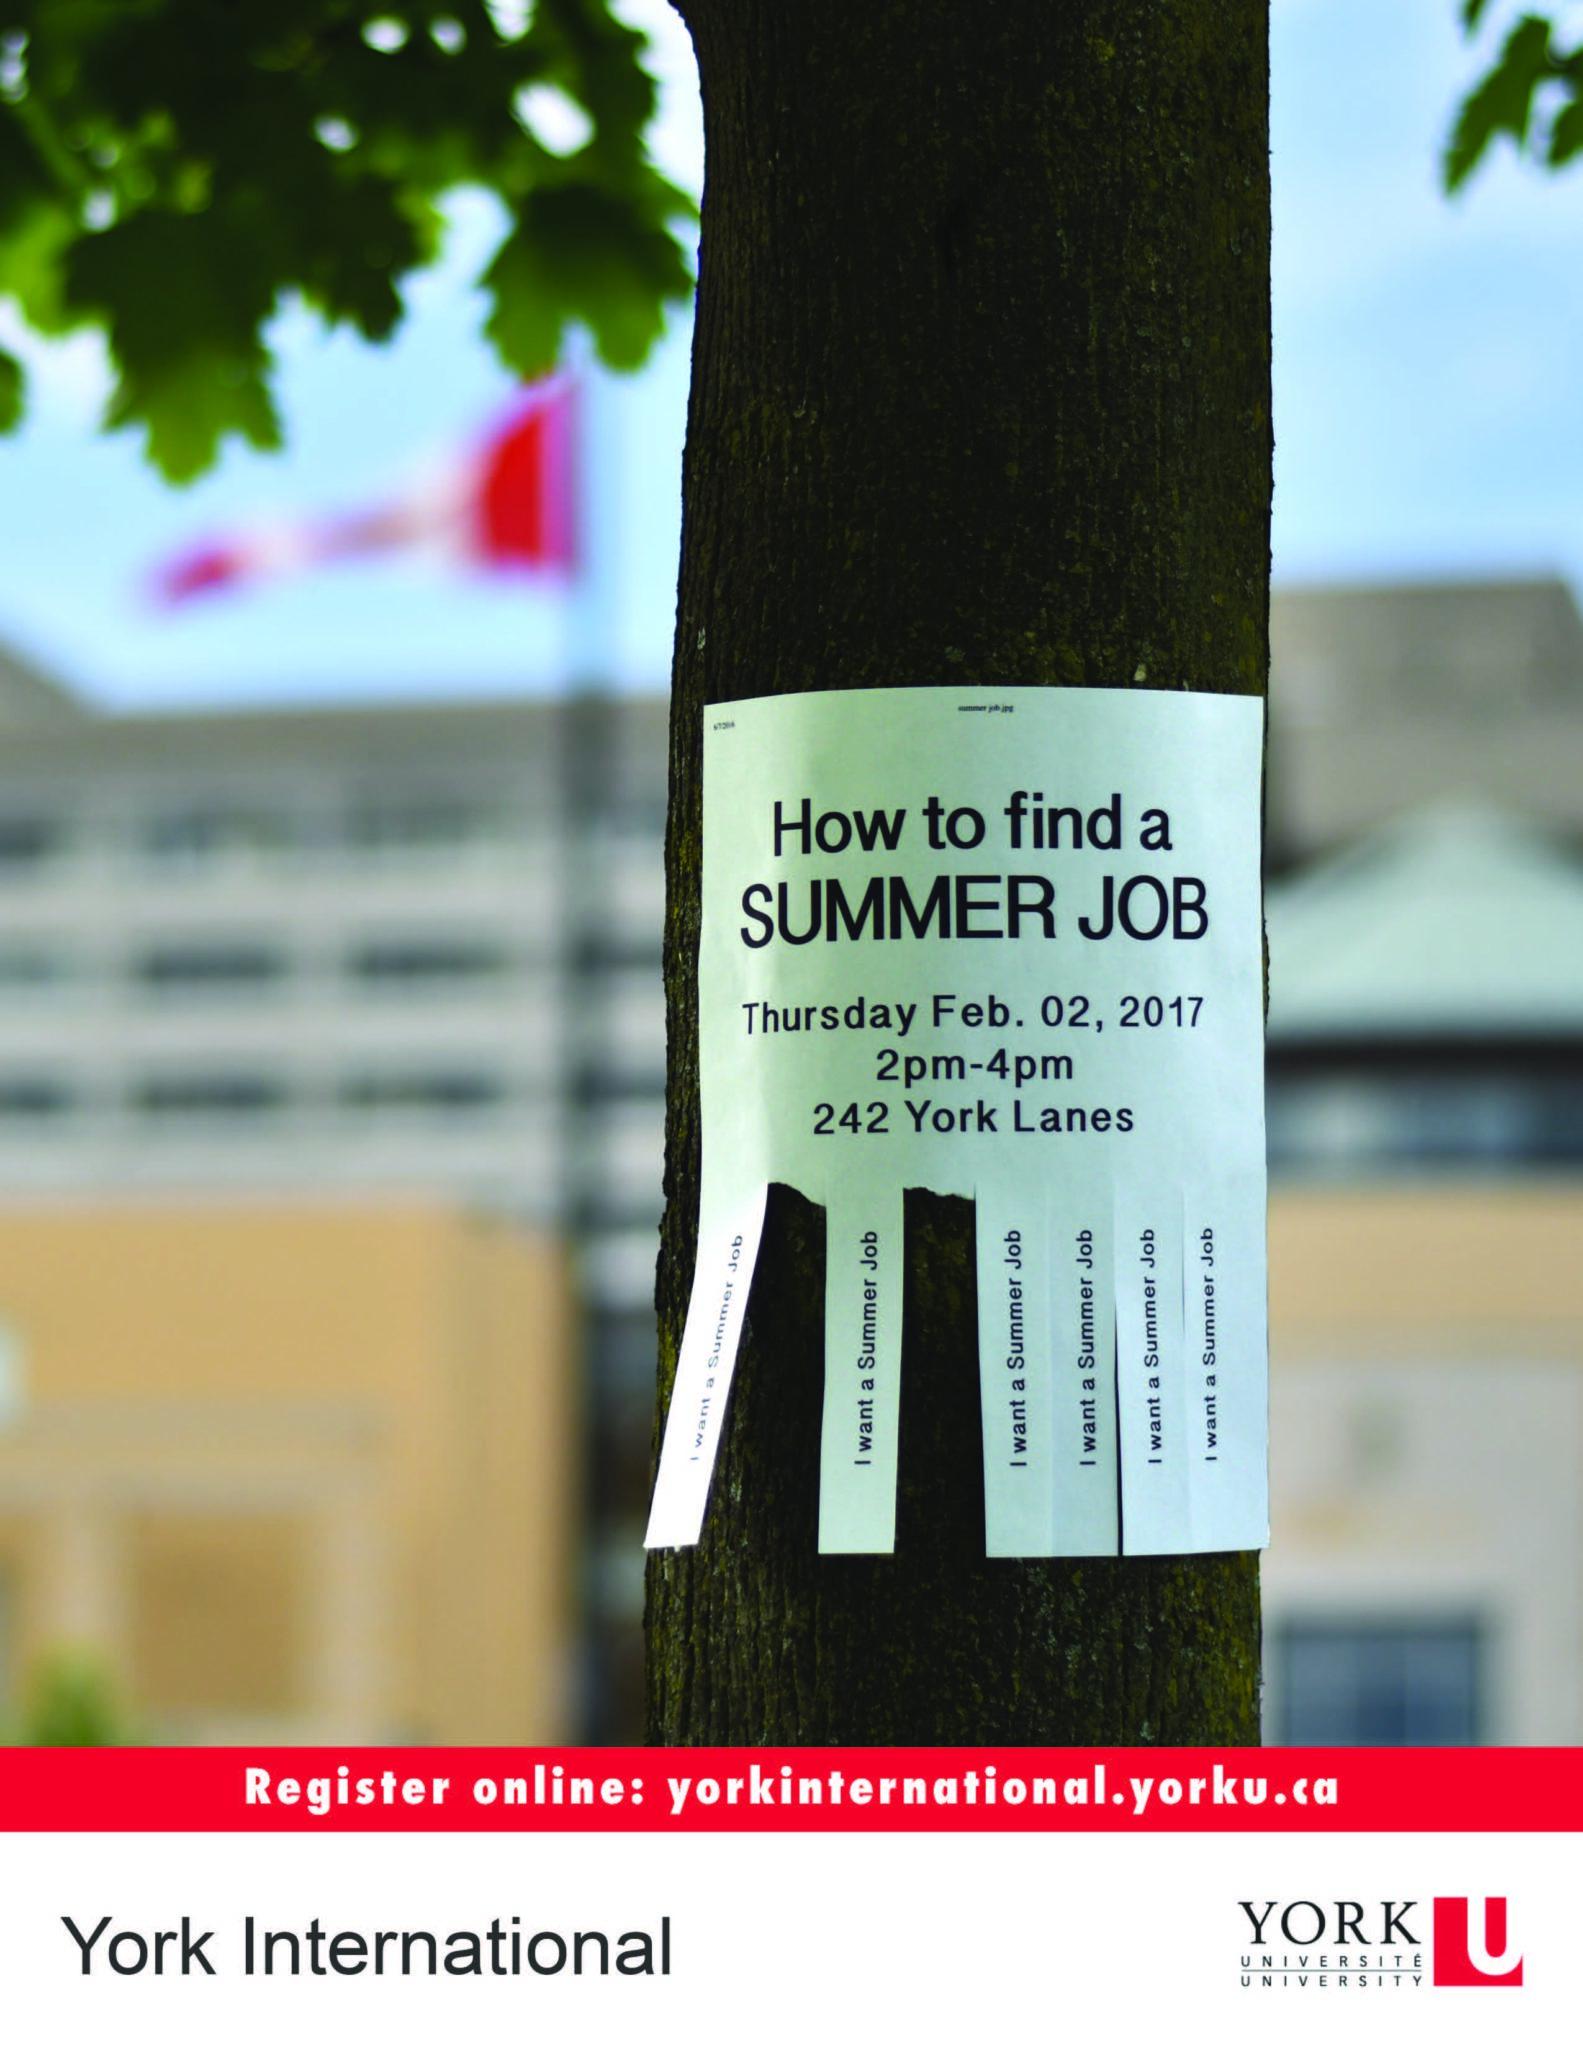 How to Find a Summer Job Workshop @ York Lanes, Room 242 (second floor)